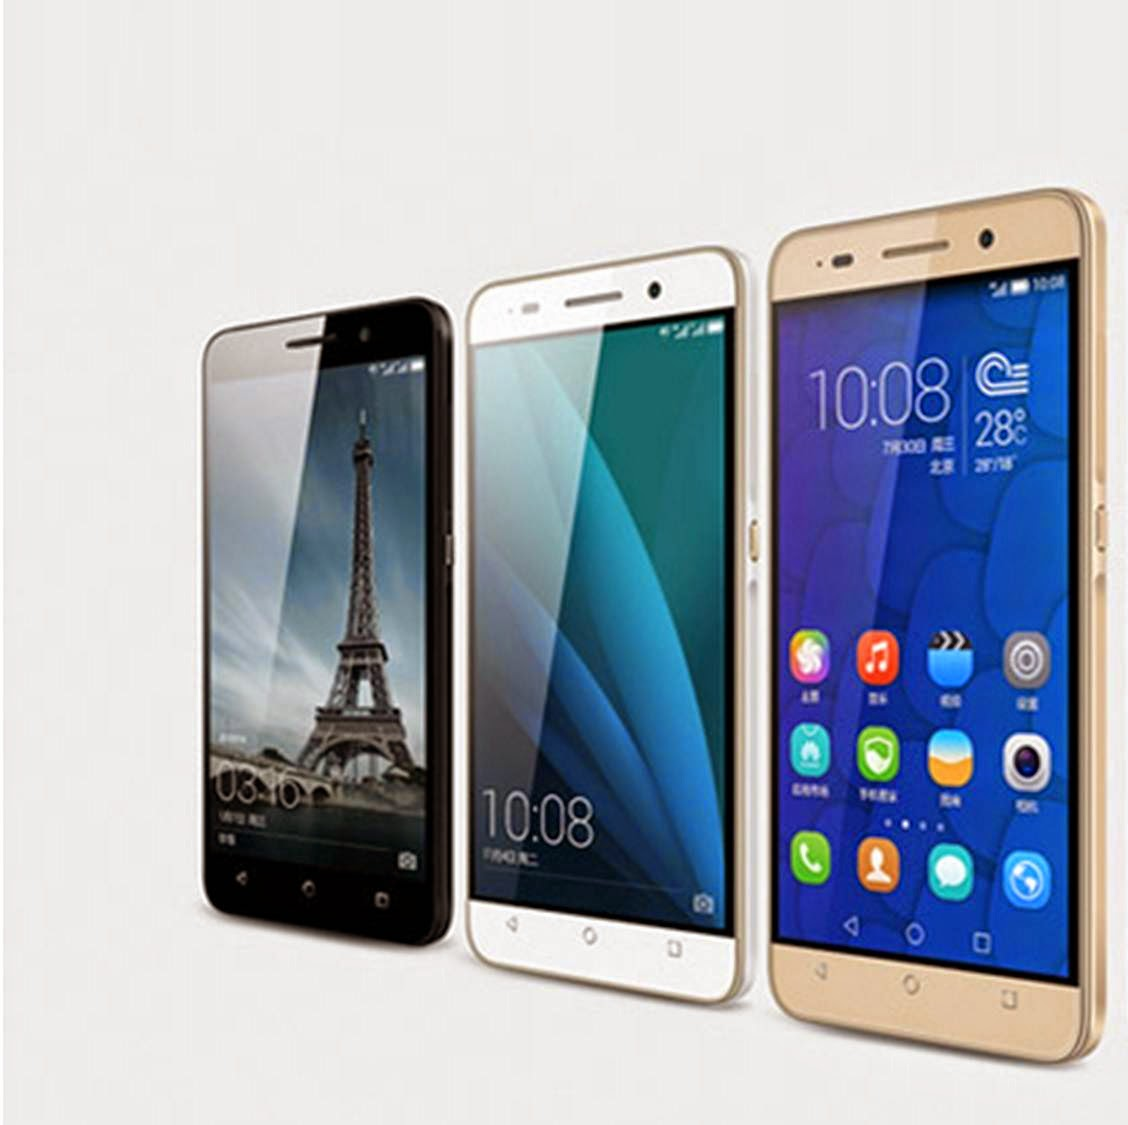 Huawei Honor 4C Smartphone 1 Jutaan Dengan Processor Octa